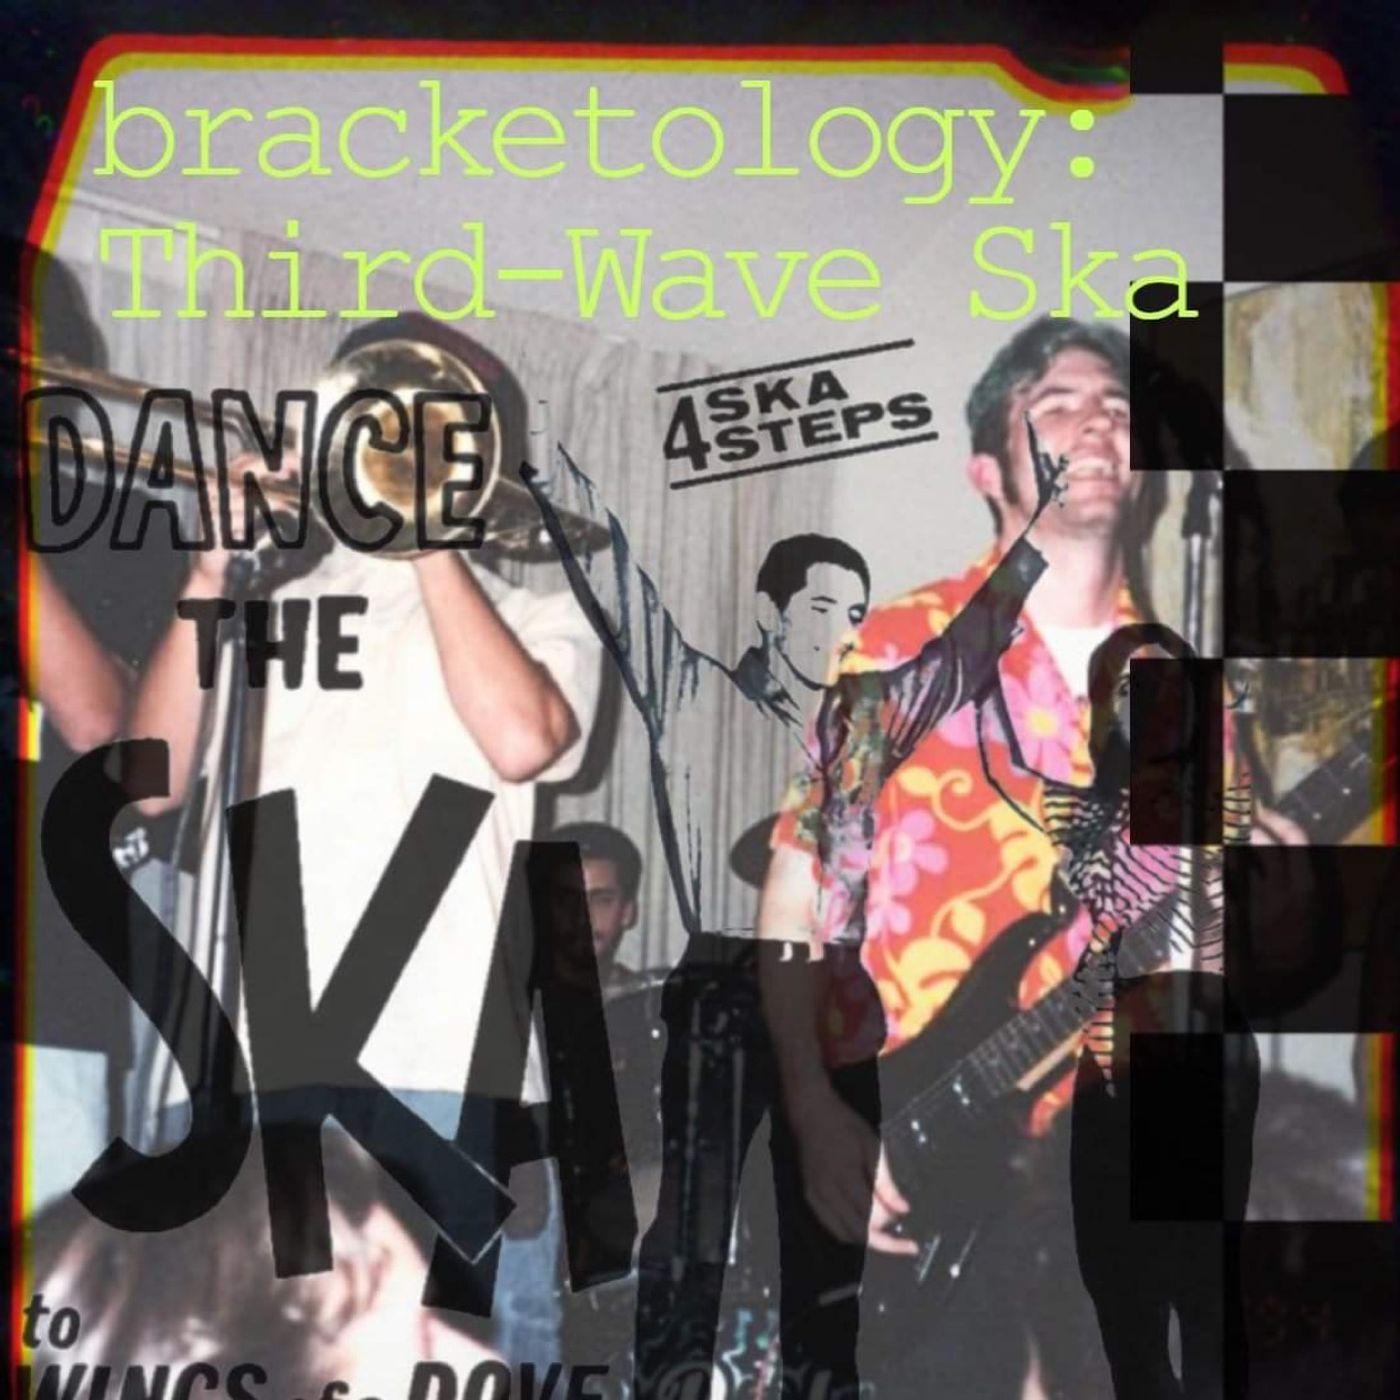 Bracketology: Third Wave Ska w/ Brandie Posey